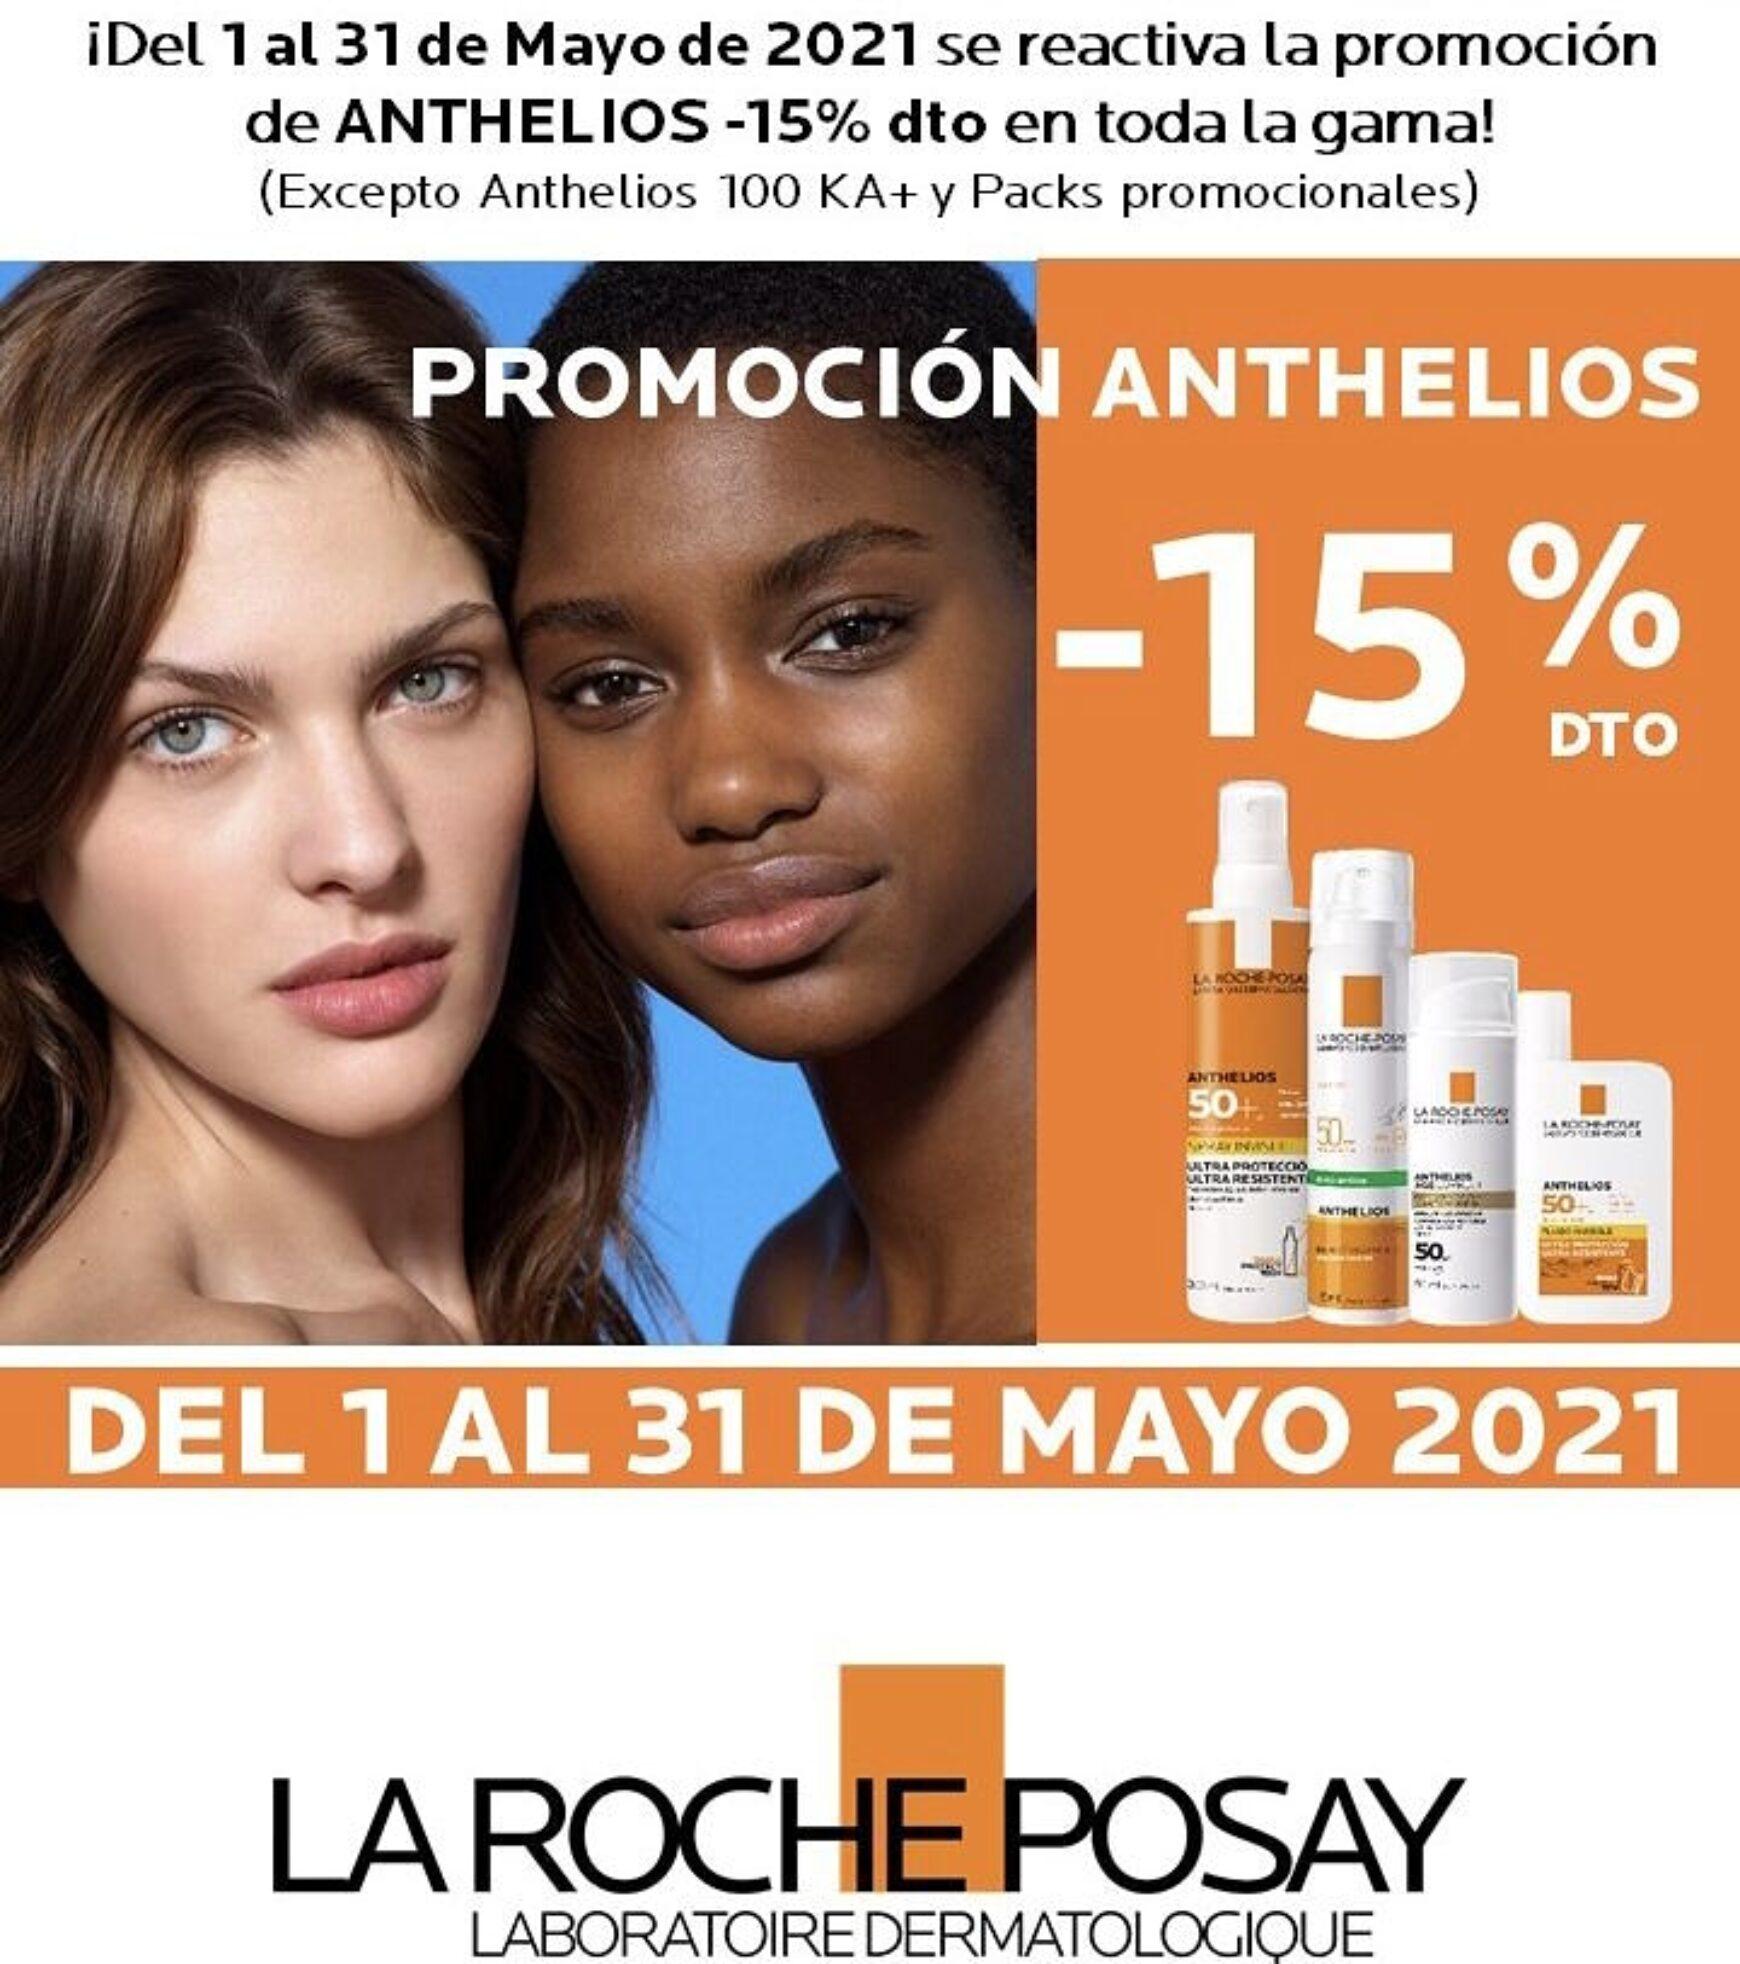 Promo Solares La Roche Posay!!!